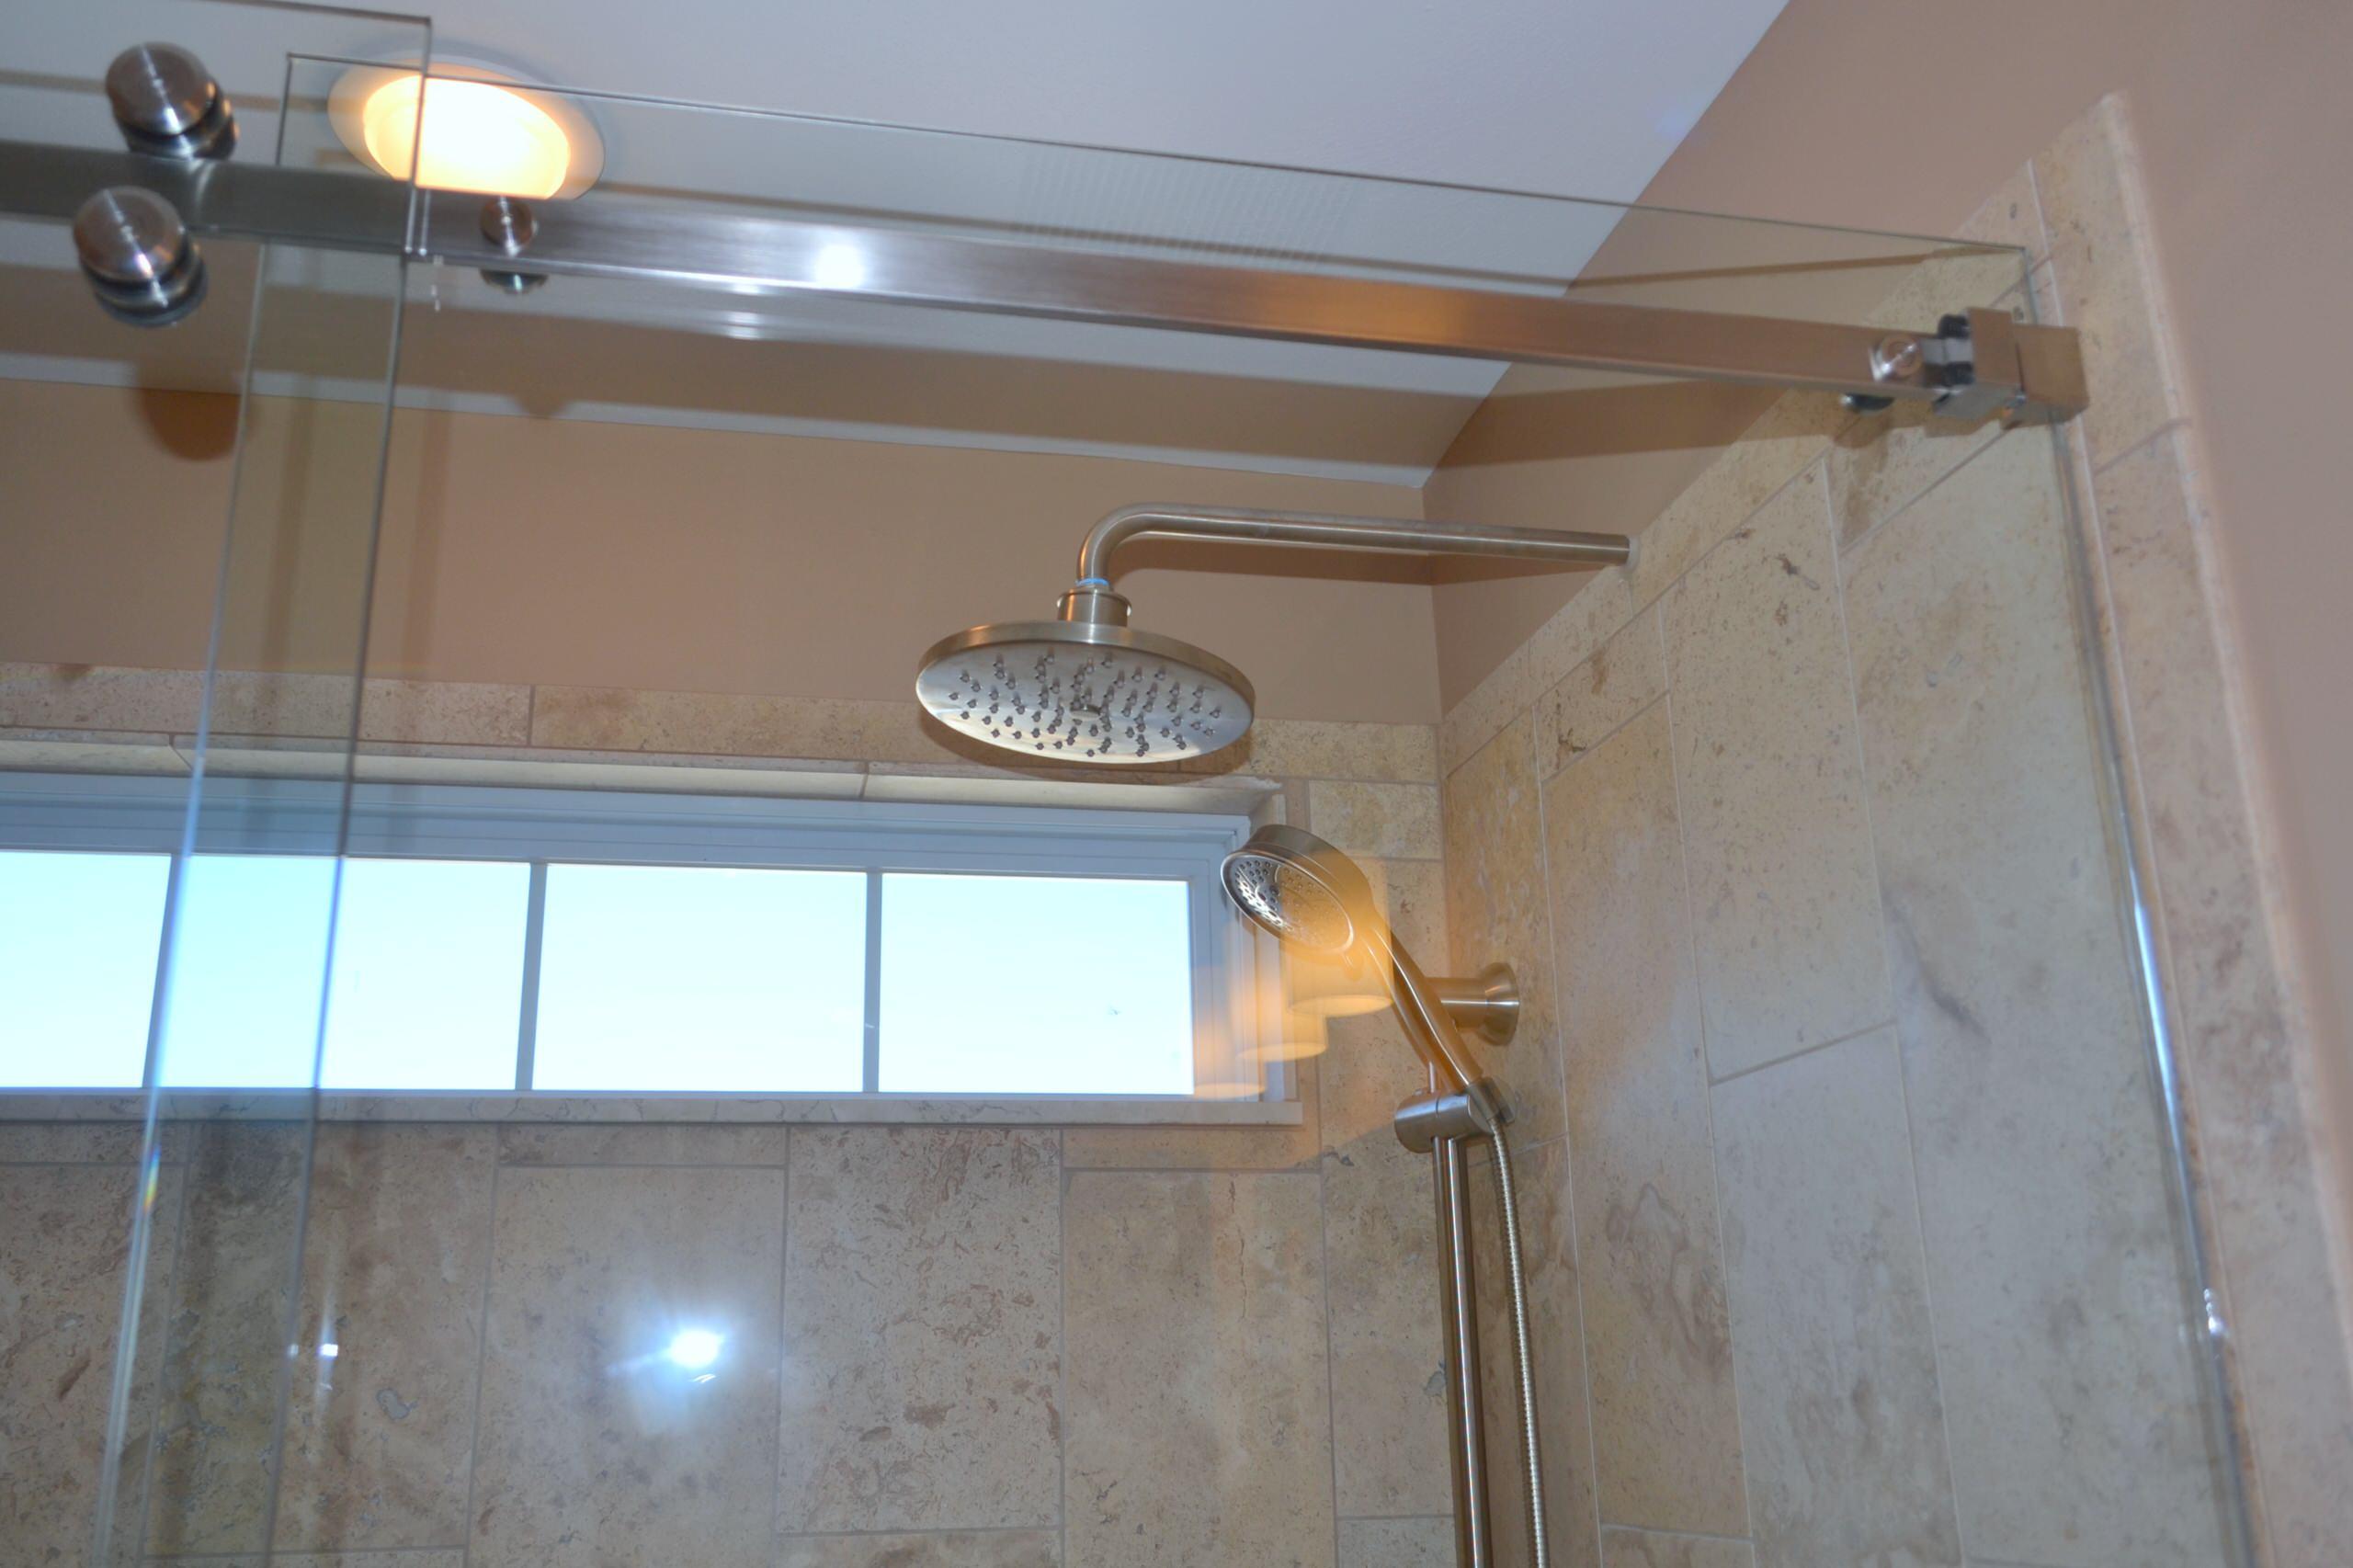 Kinder hall bath